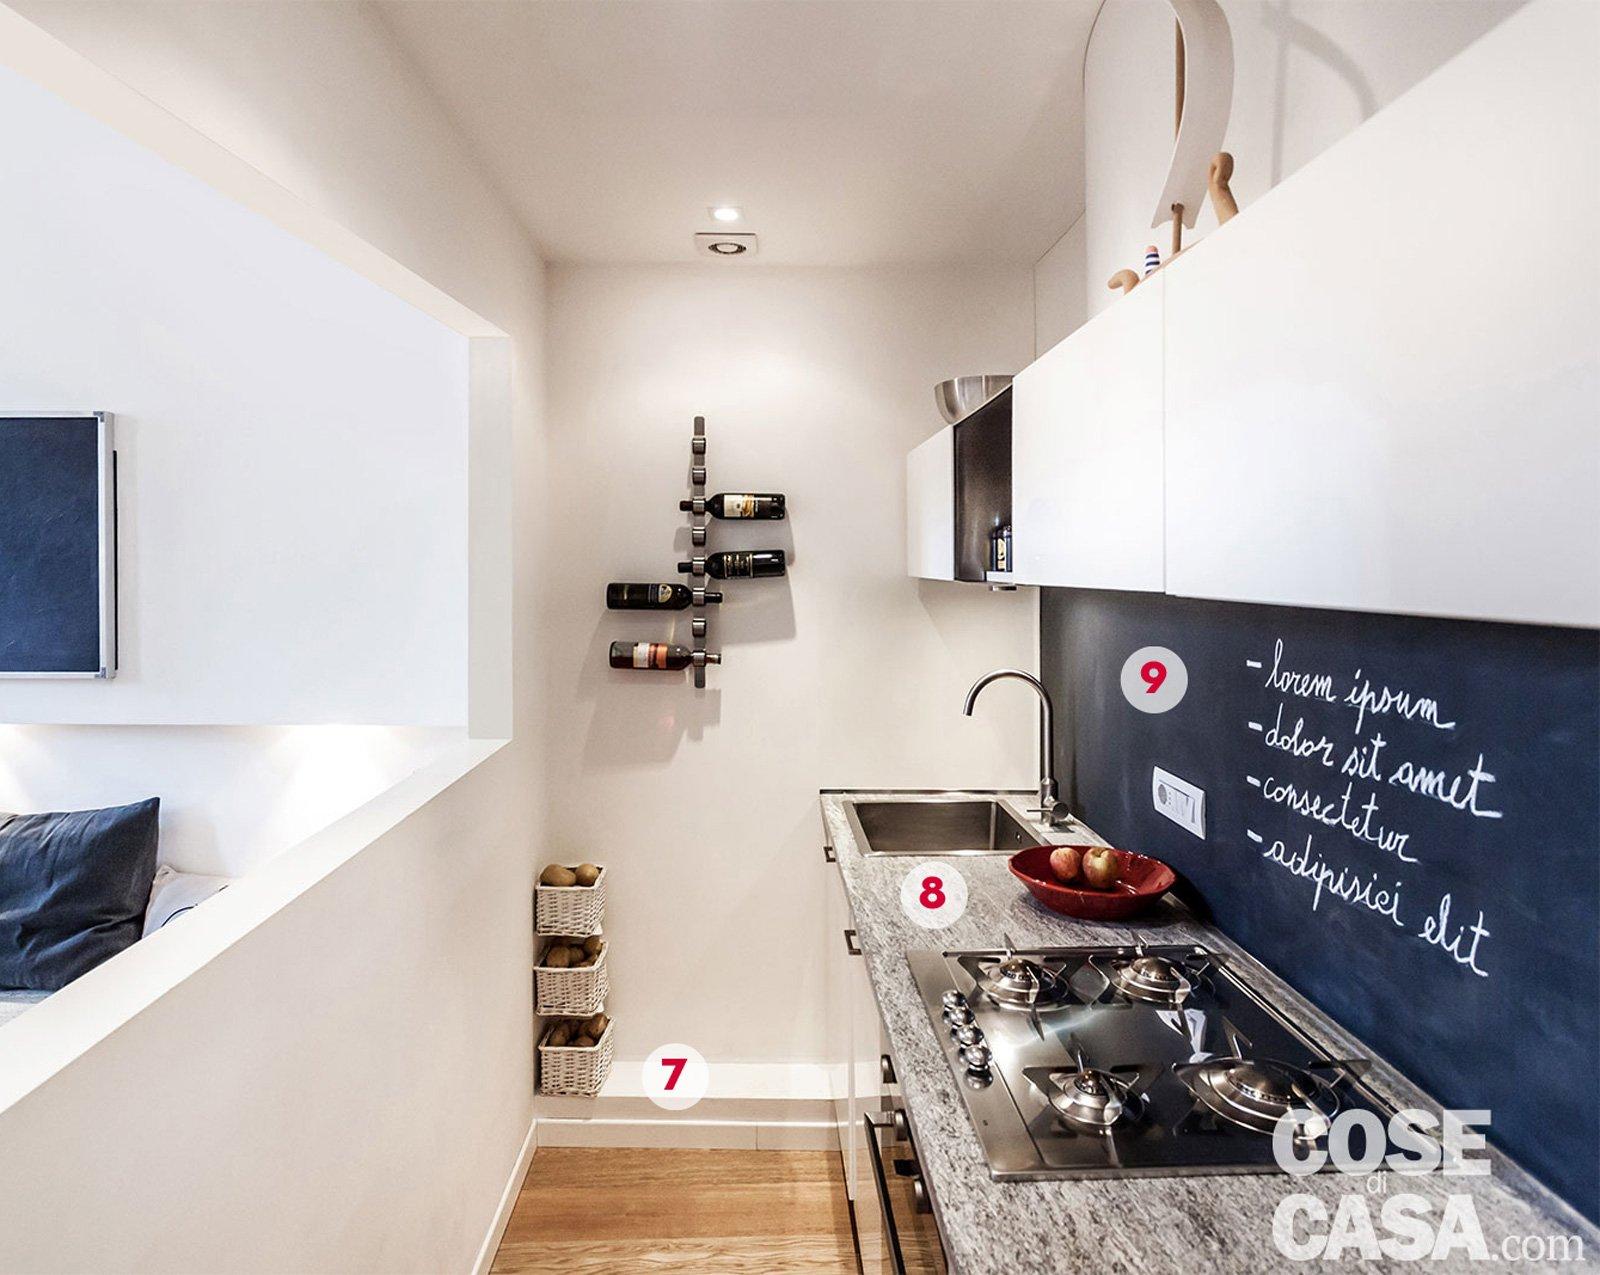 Cucina piano cottura cose di casa for Piano cottura cucina